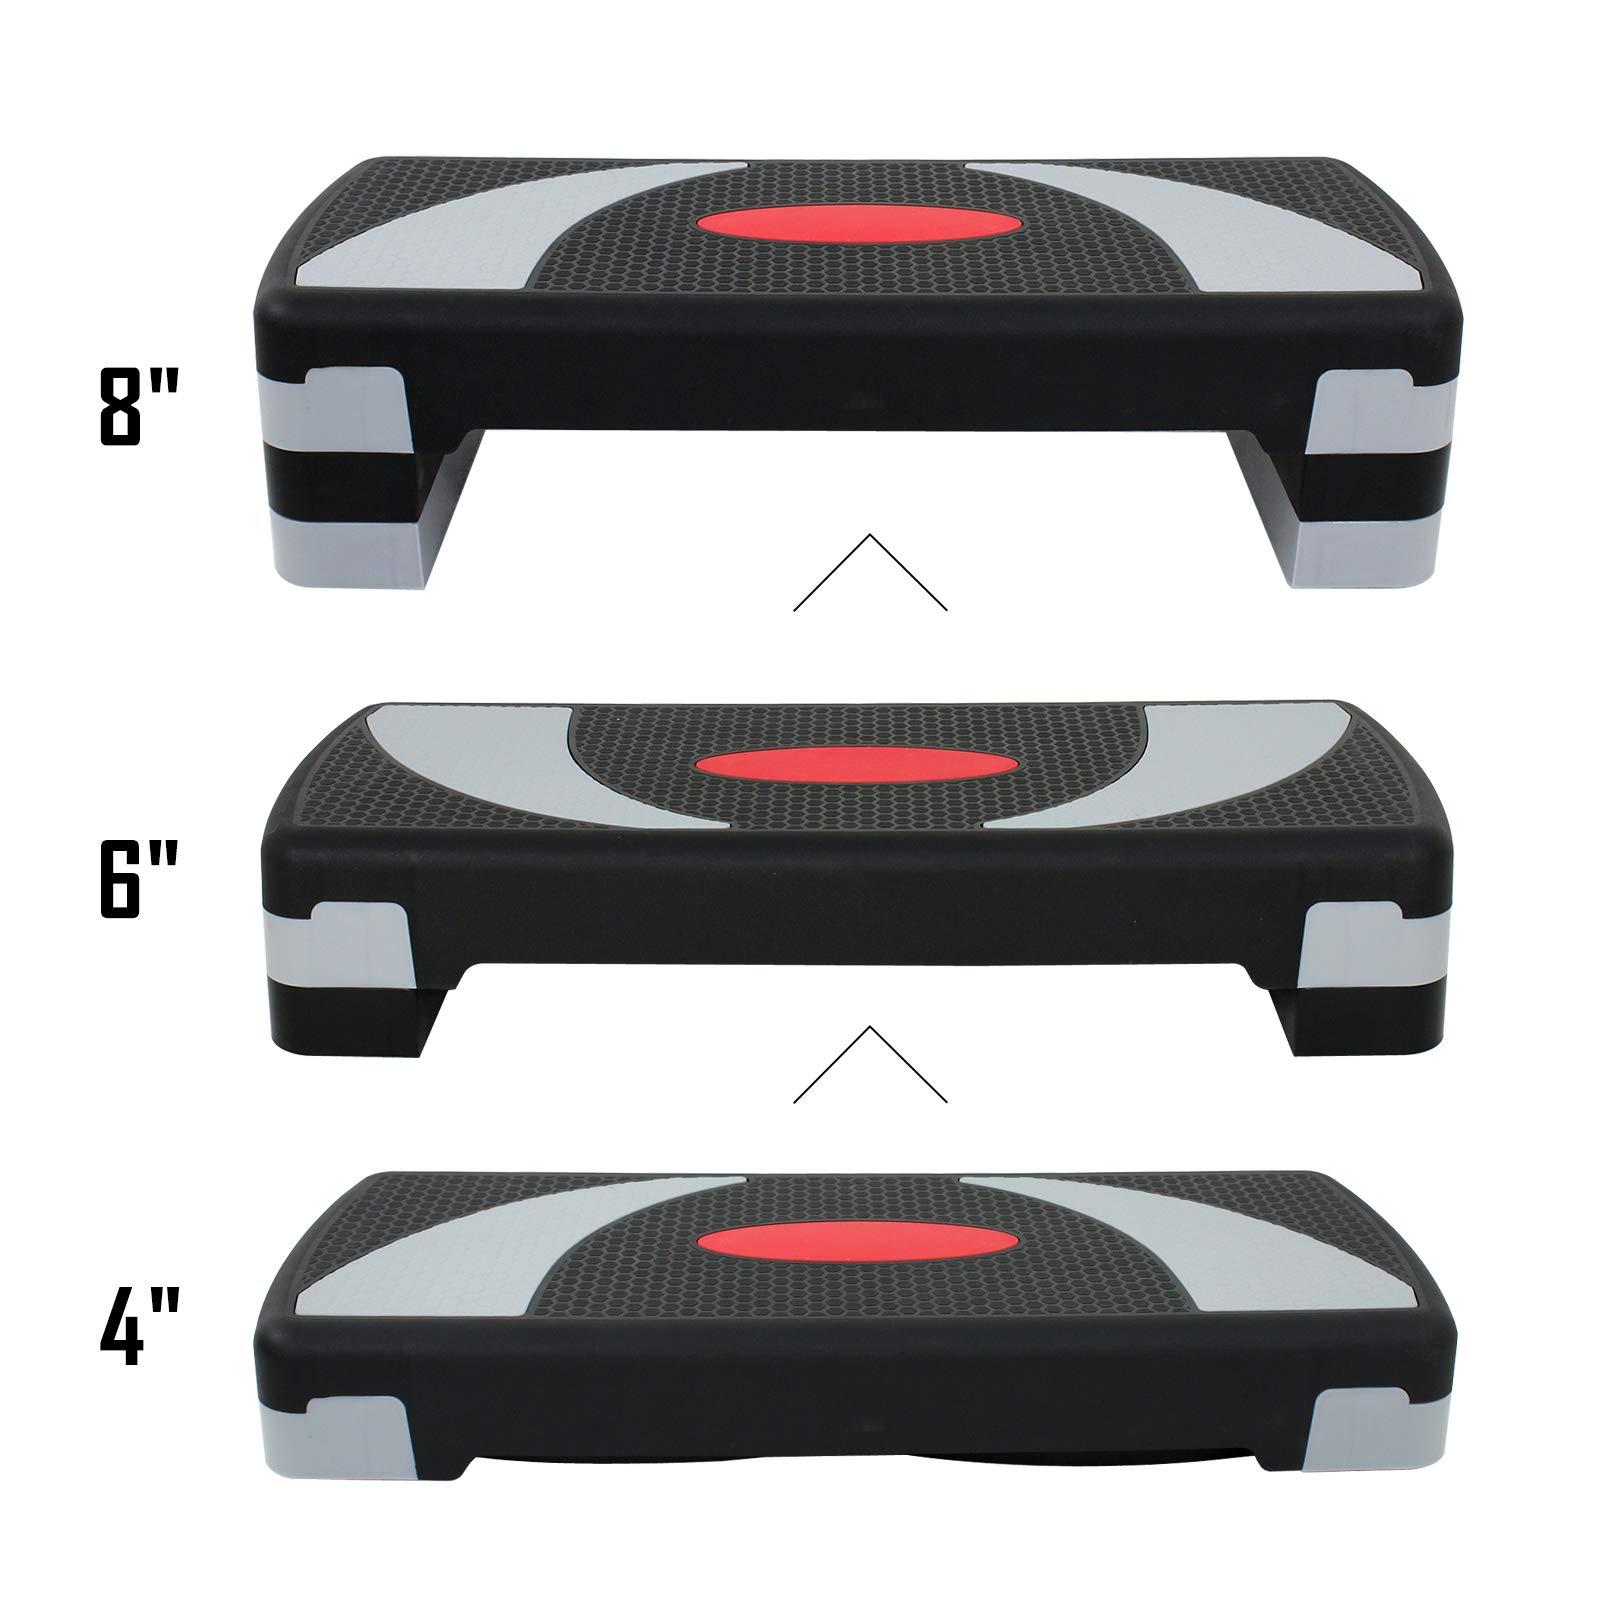 ZENY 31'' Aerobic Stepper Platform Aerobics Trainer Adjustable Exercise Fitness Workout Stepper Adjust 4'' - 6'' - 8'' by ZENY